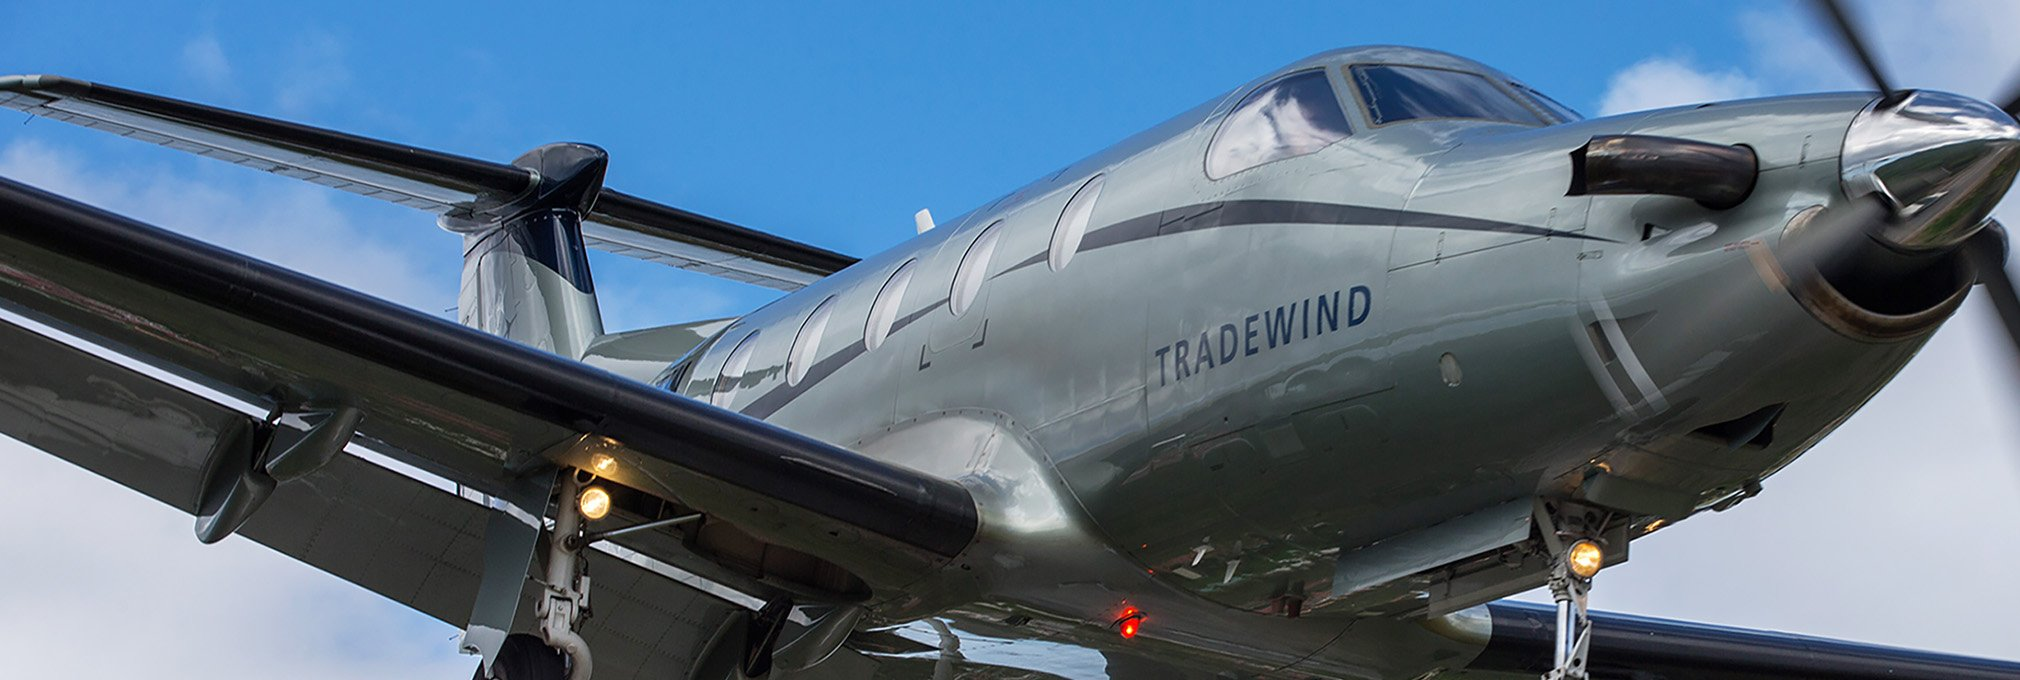 plane photo TJ